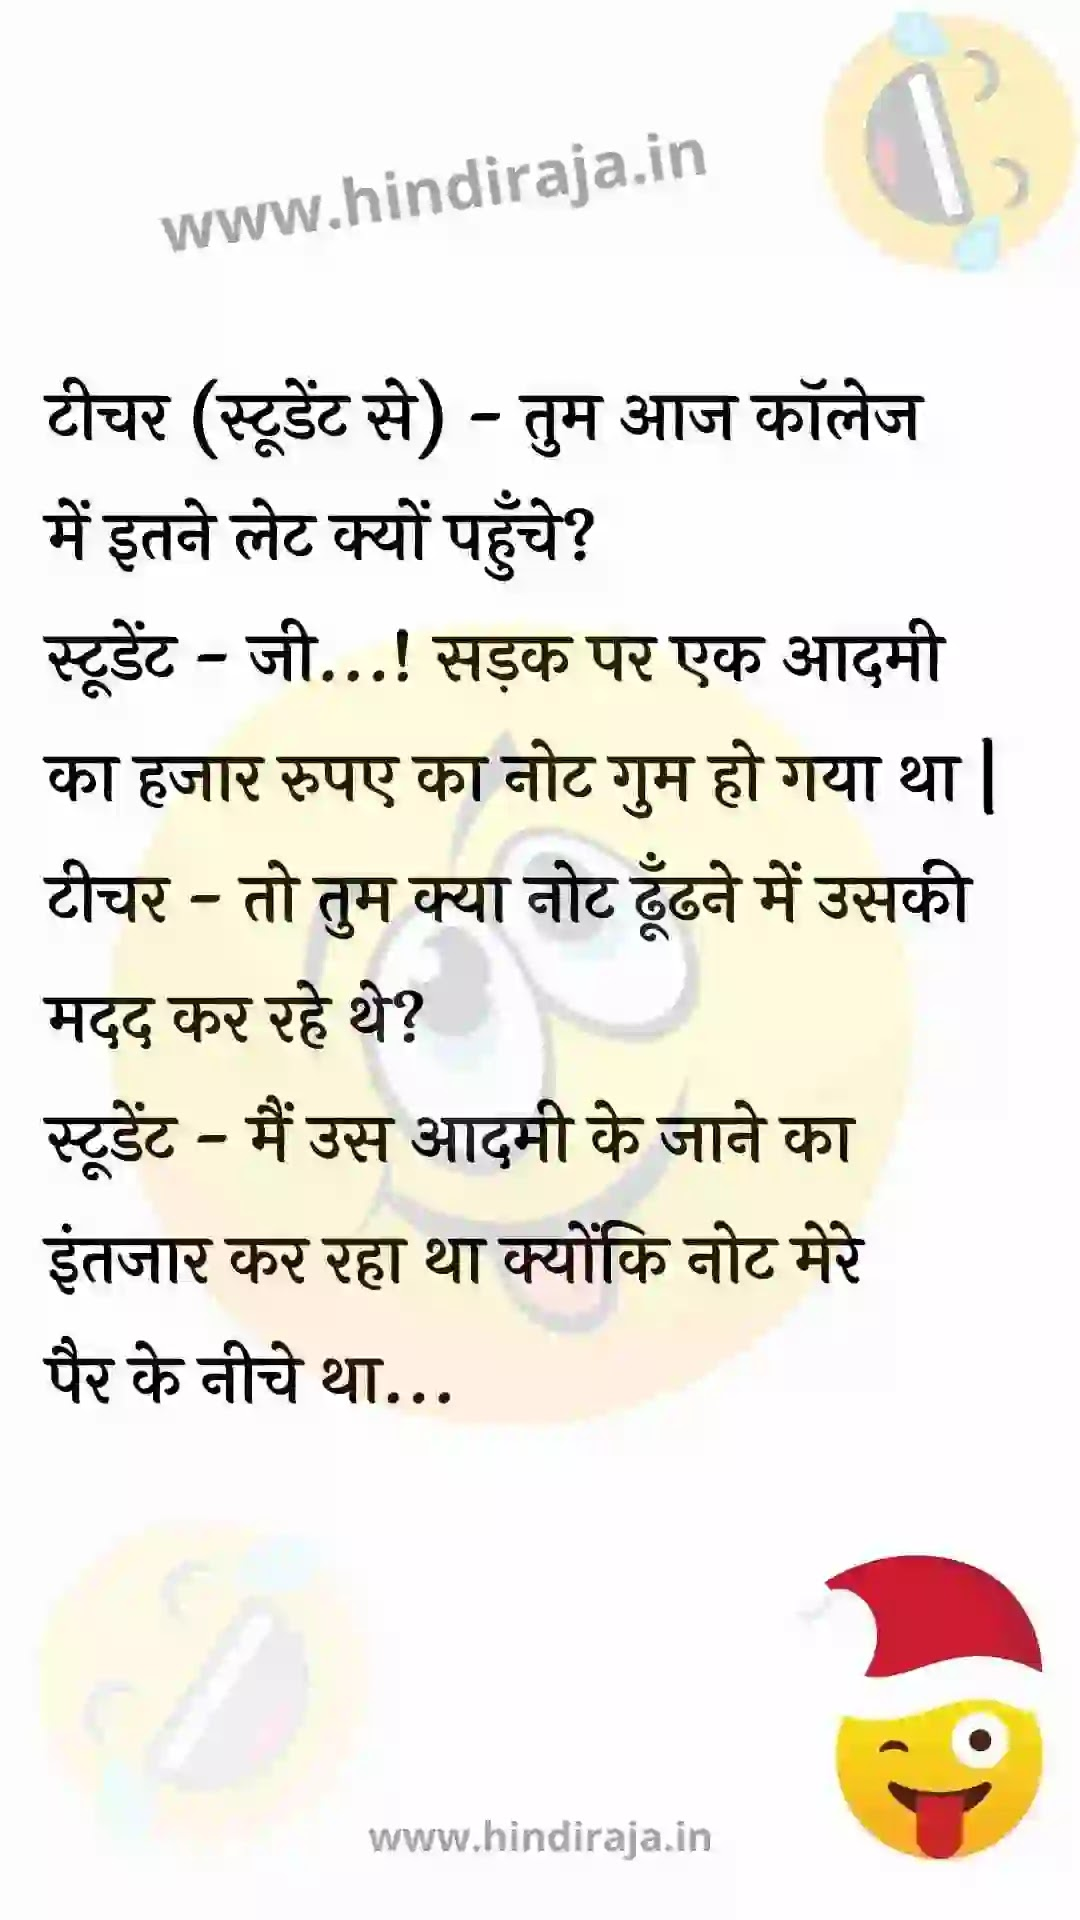 whatsapp jokes, funniest hindi jokes for whatsapp